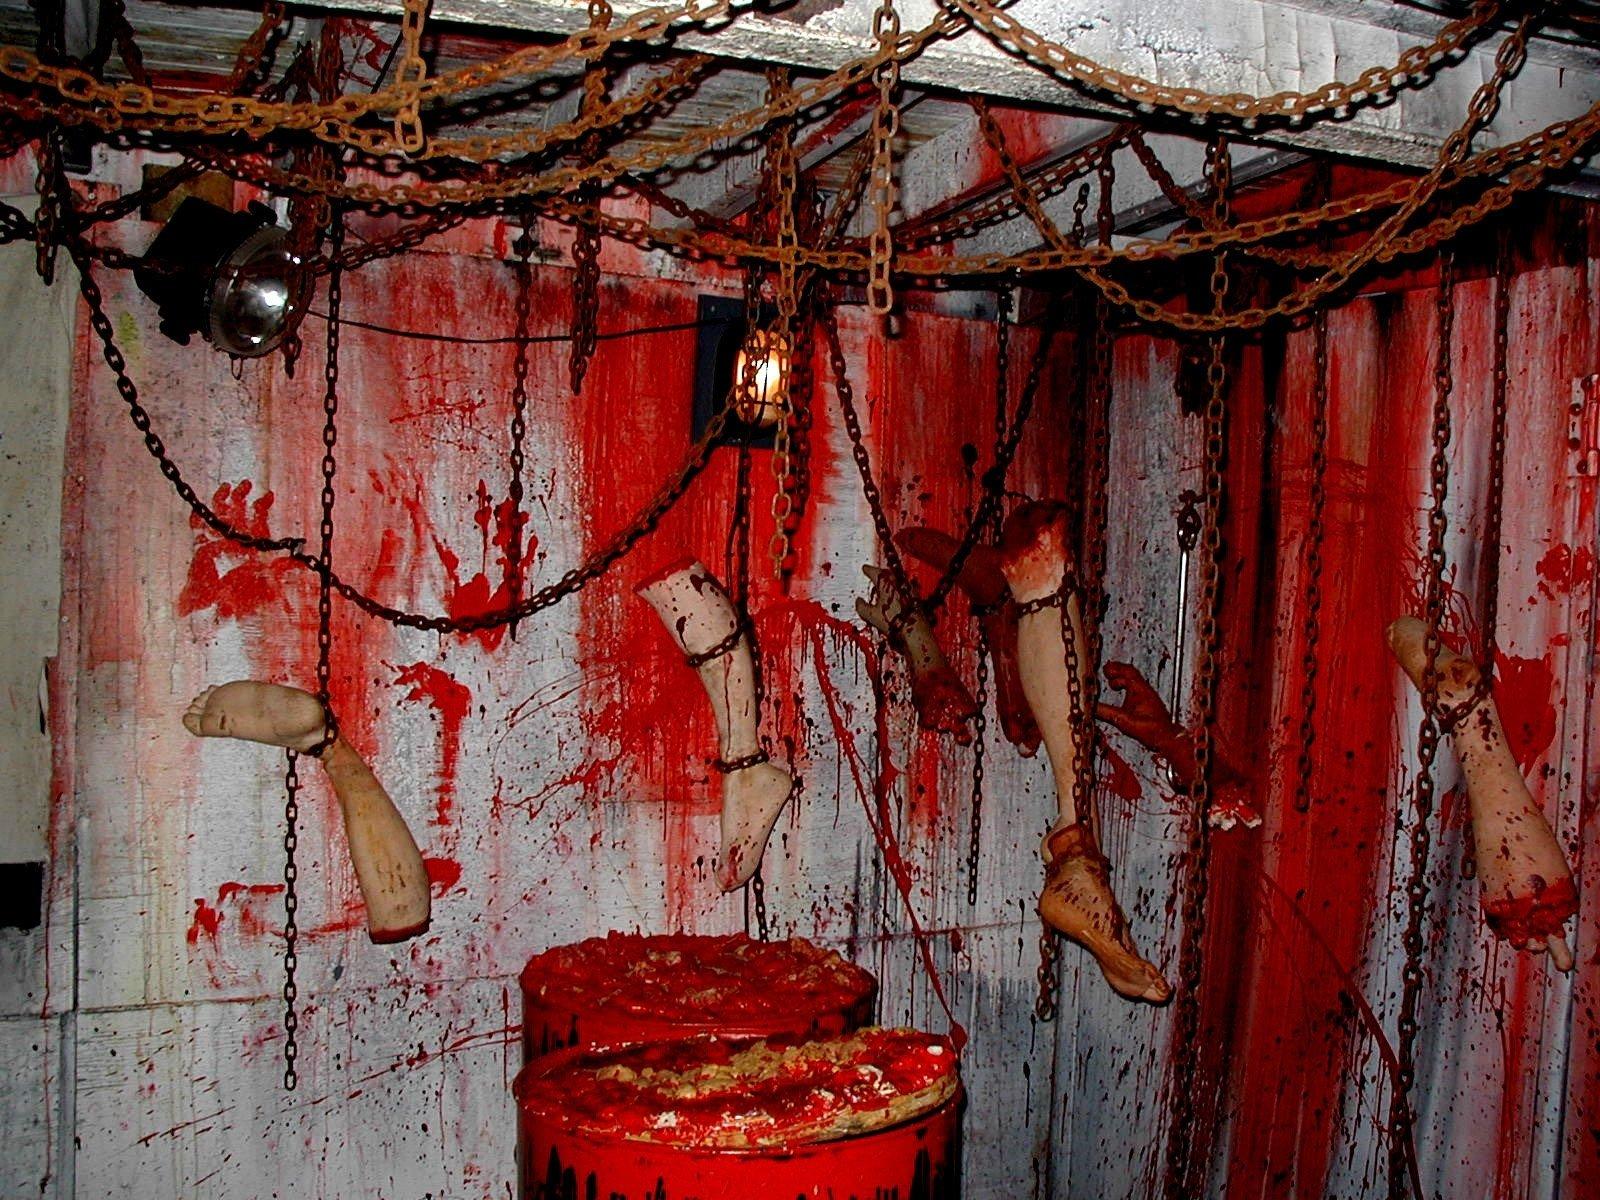 10 Stunning Halloween Haunted House Room Ideas pinelizabeth gobin mcelney on halloween pinterest haunted 2 2021